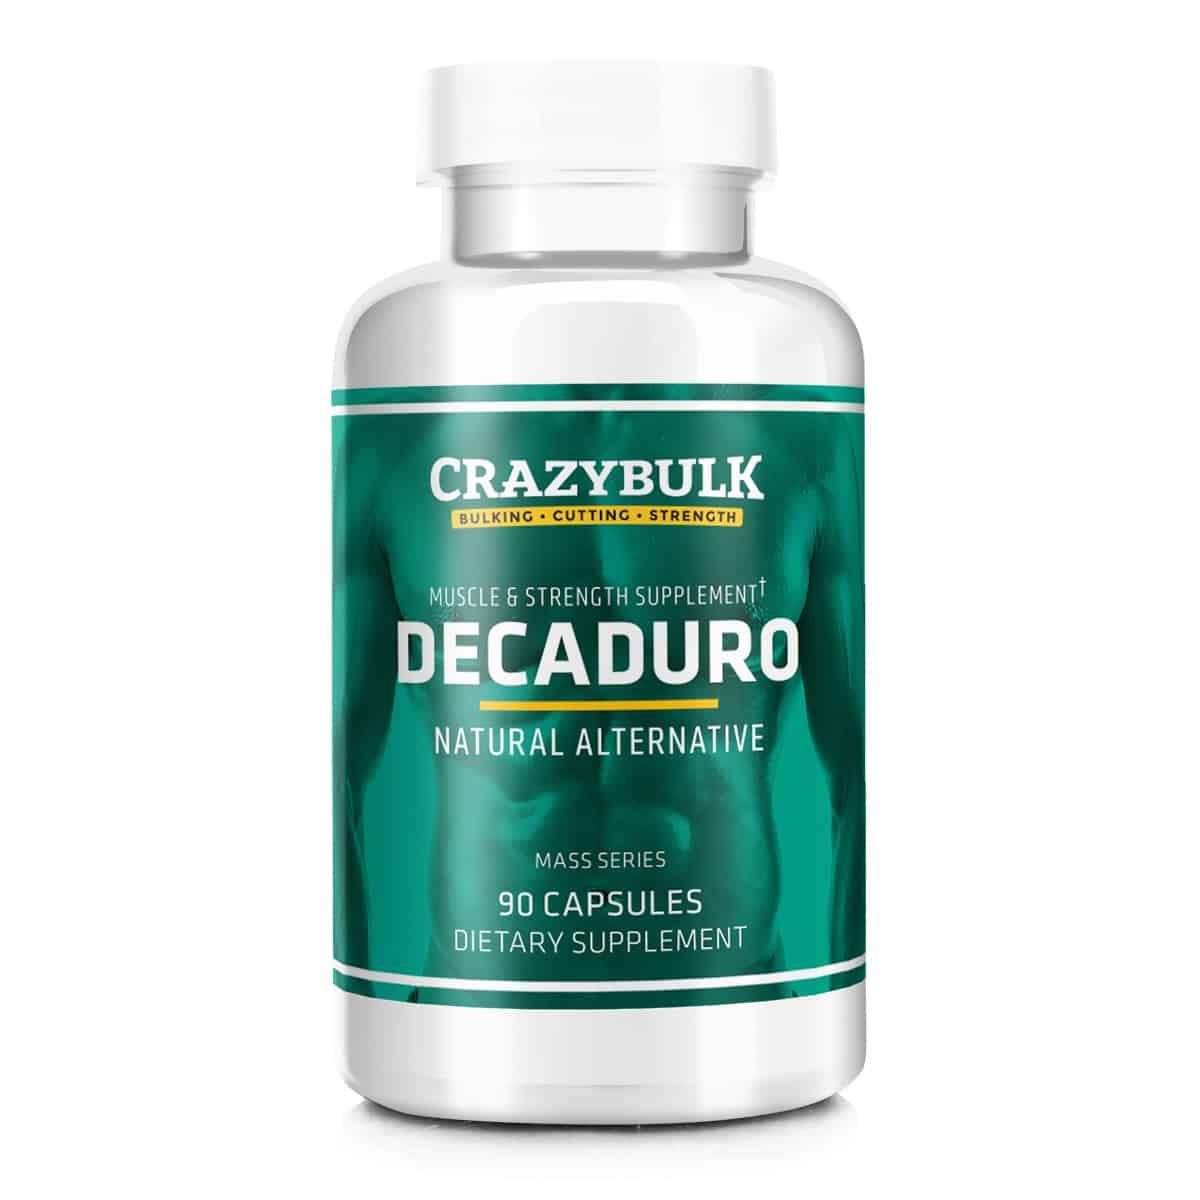 Decaduro : Deca Durabolin légal sans effets secondaires